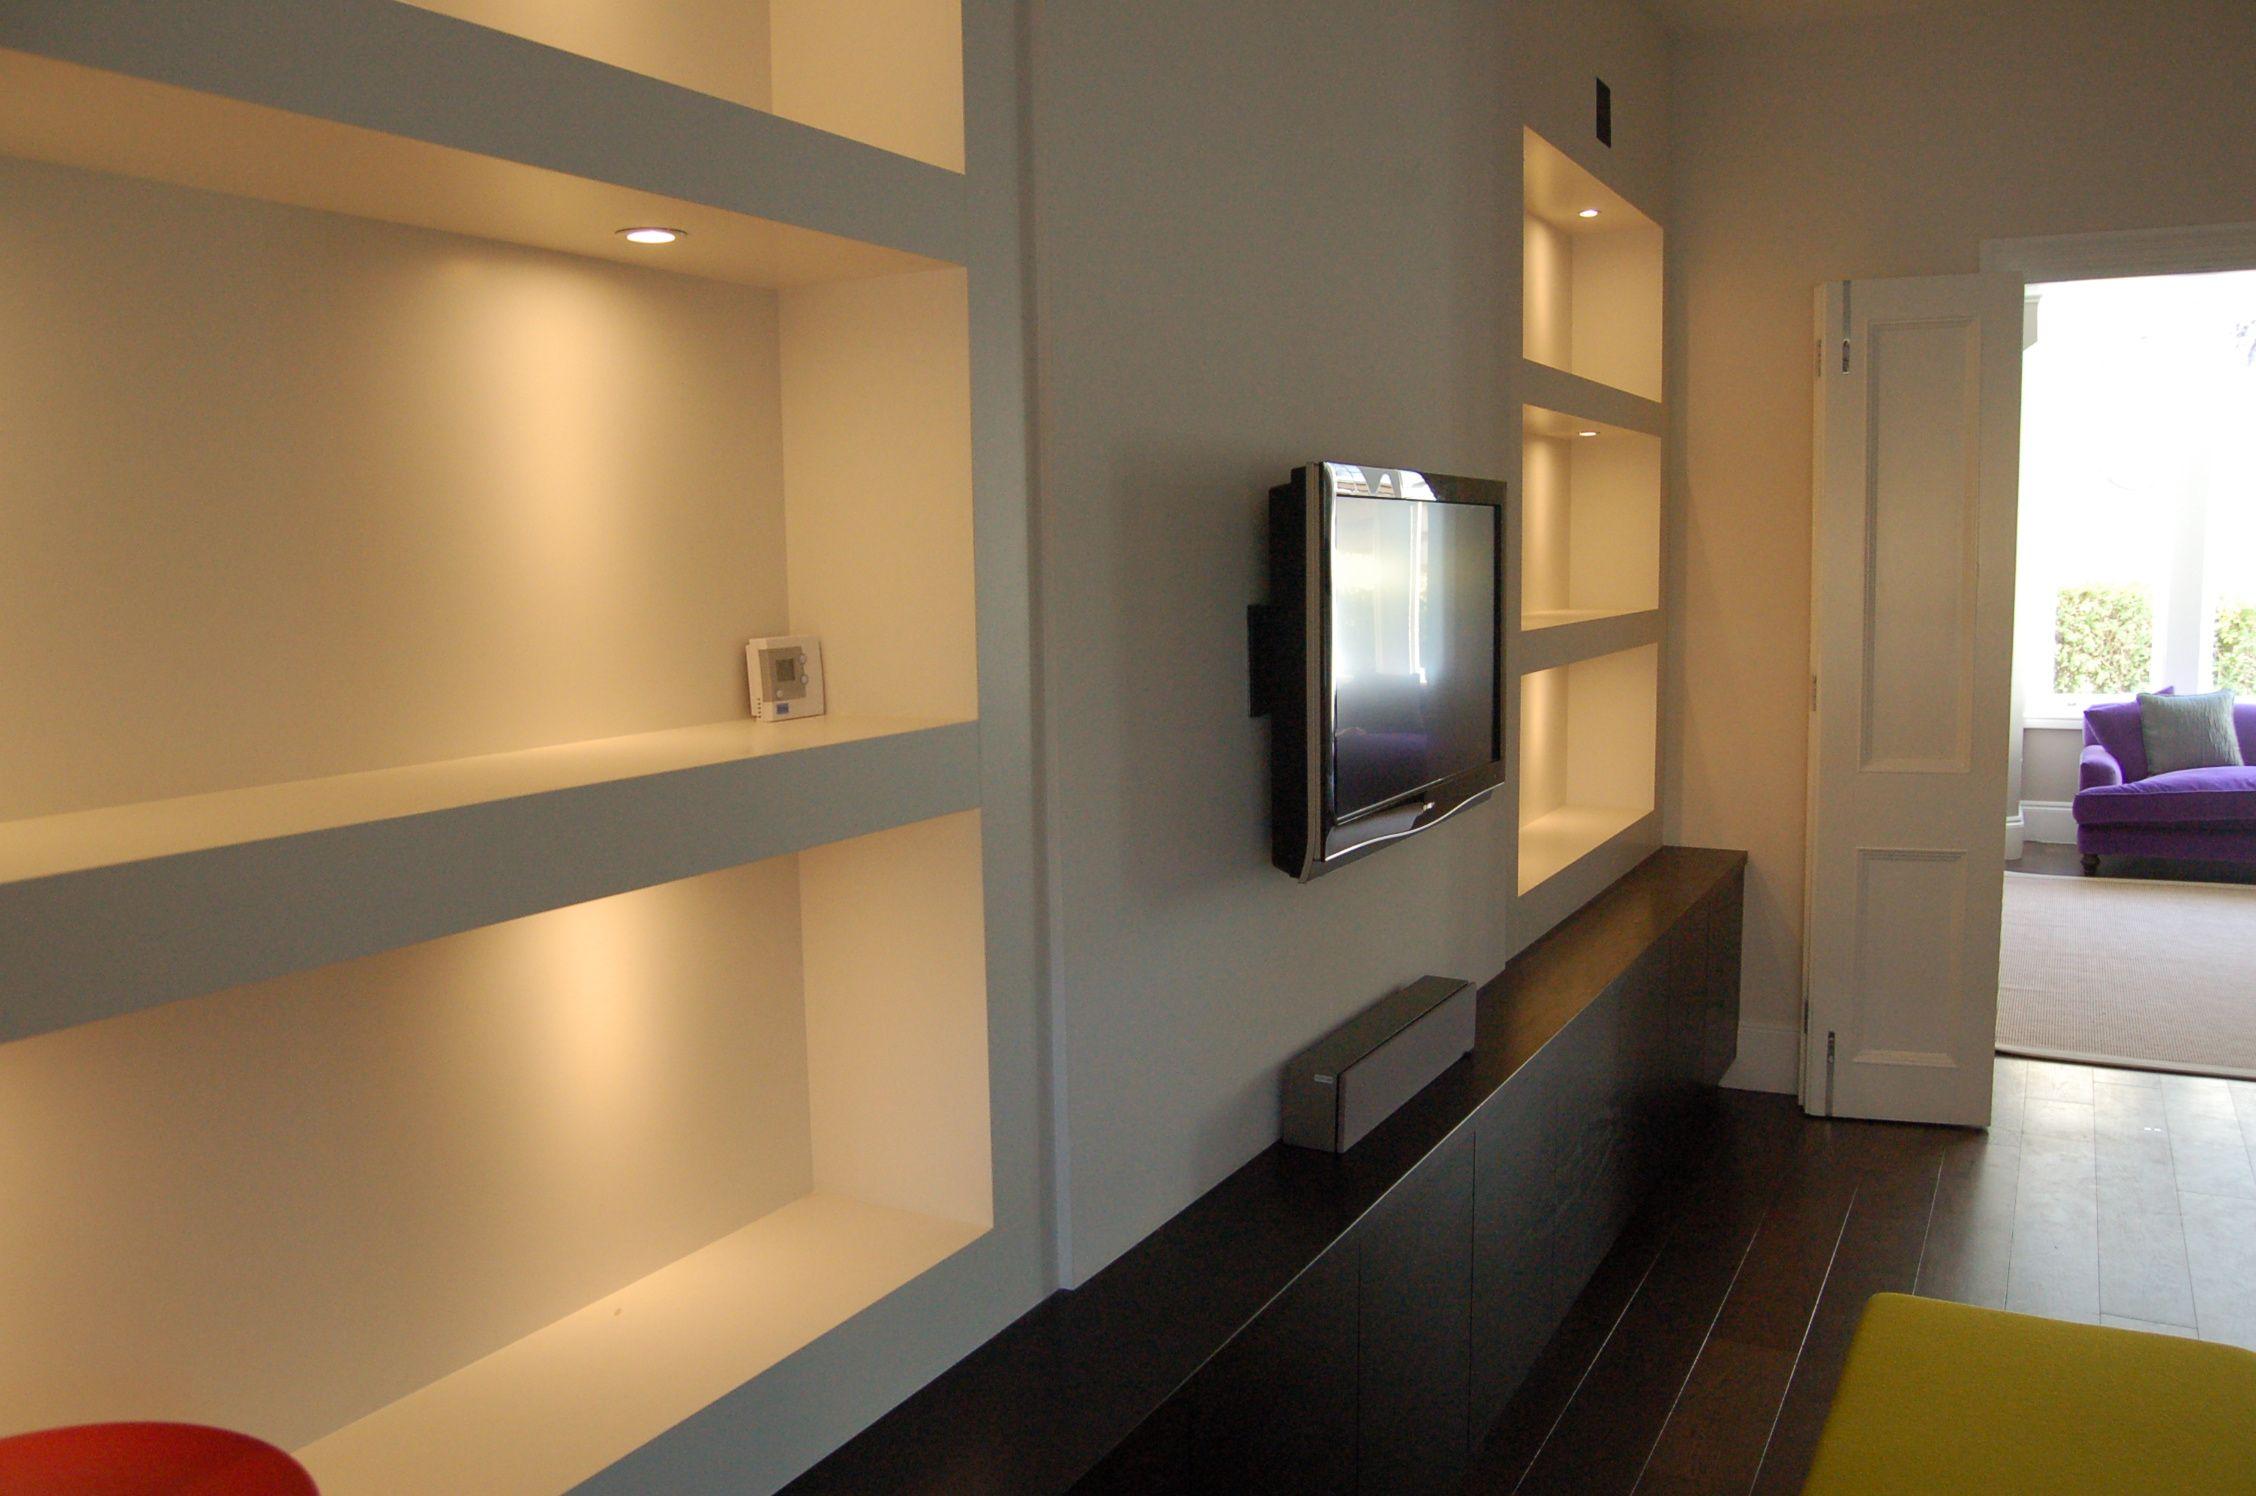 pin on stuff mom likes. Black Bedroom Furniture Sets. Home Design Ideas